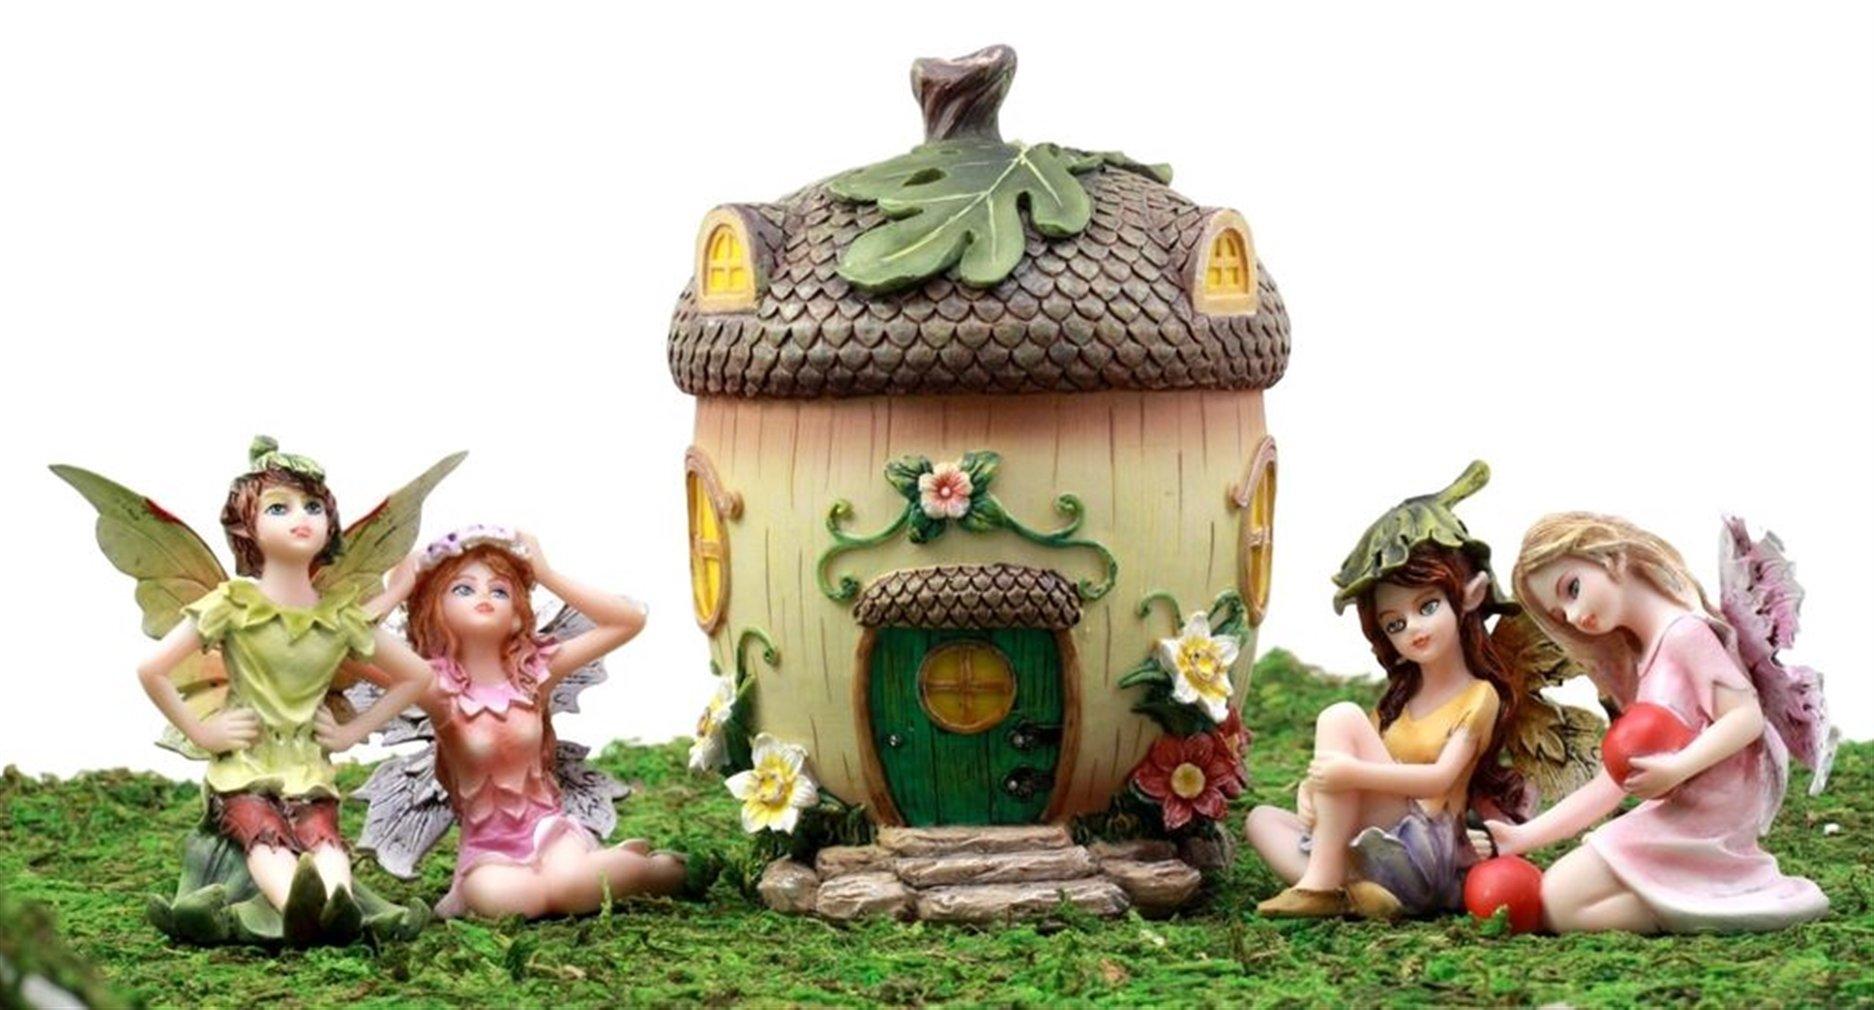 Ky & Co YesKela Fairy Garden Miniatures Starter Kit Acorn Home & Fairy Figurines Set of 5 pcs